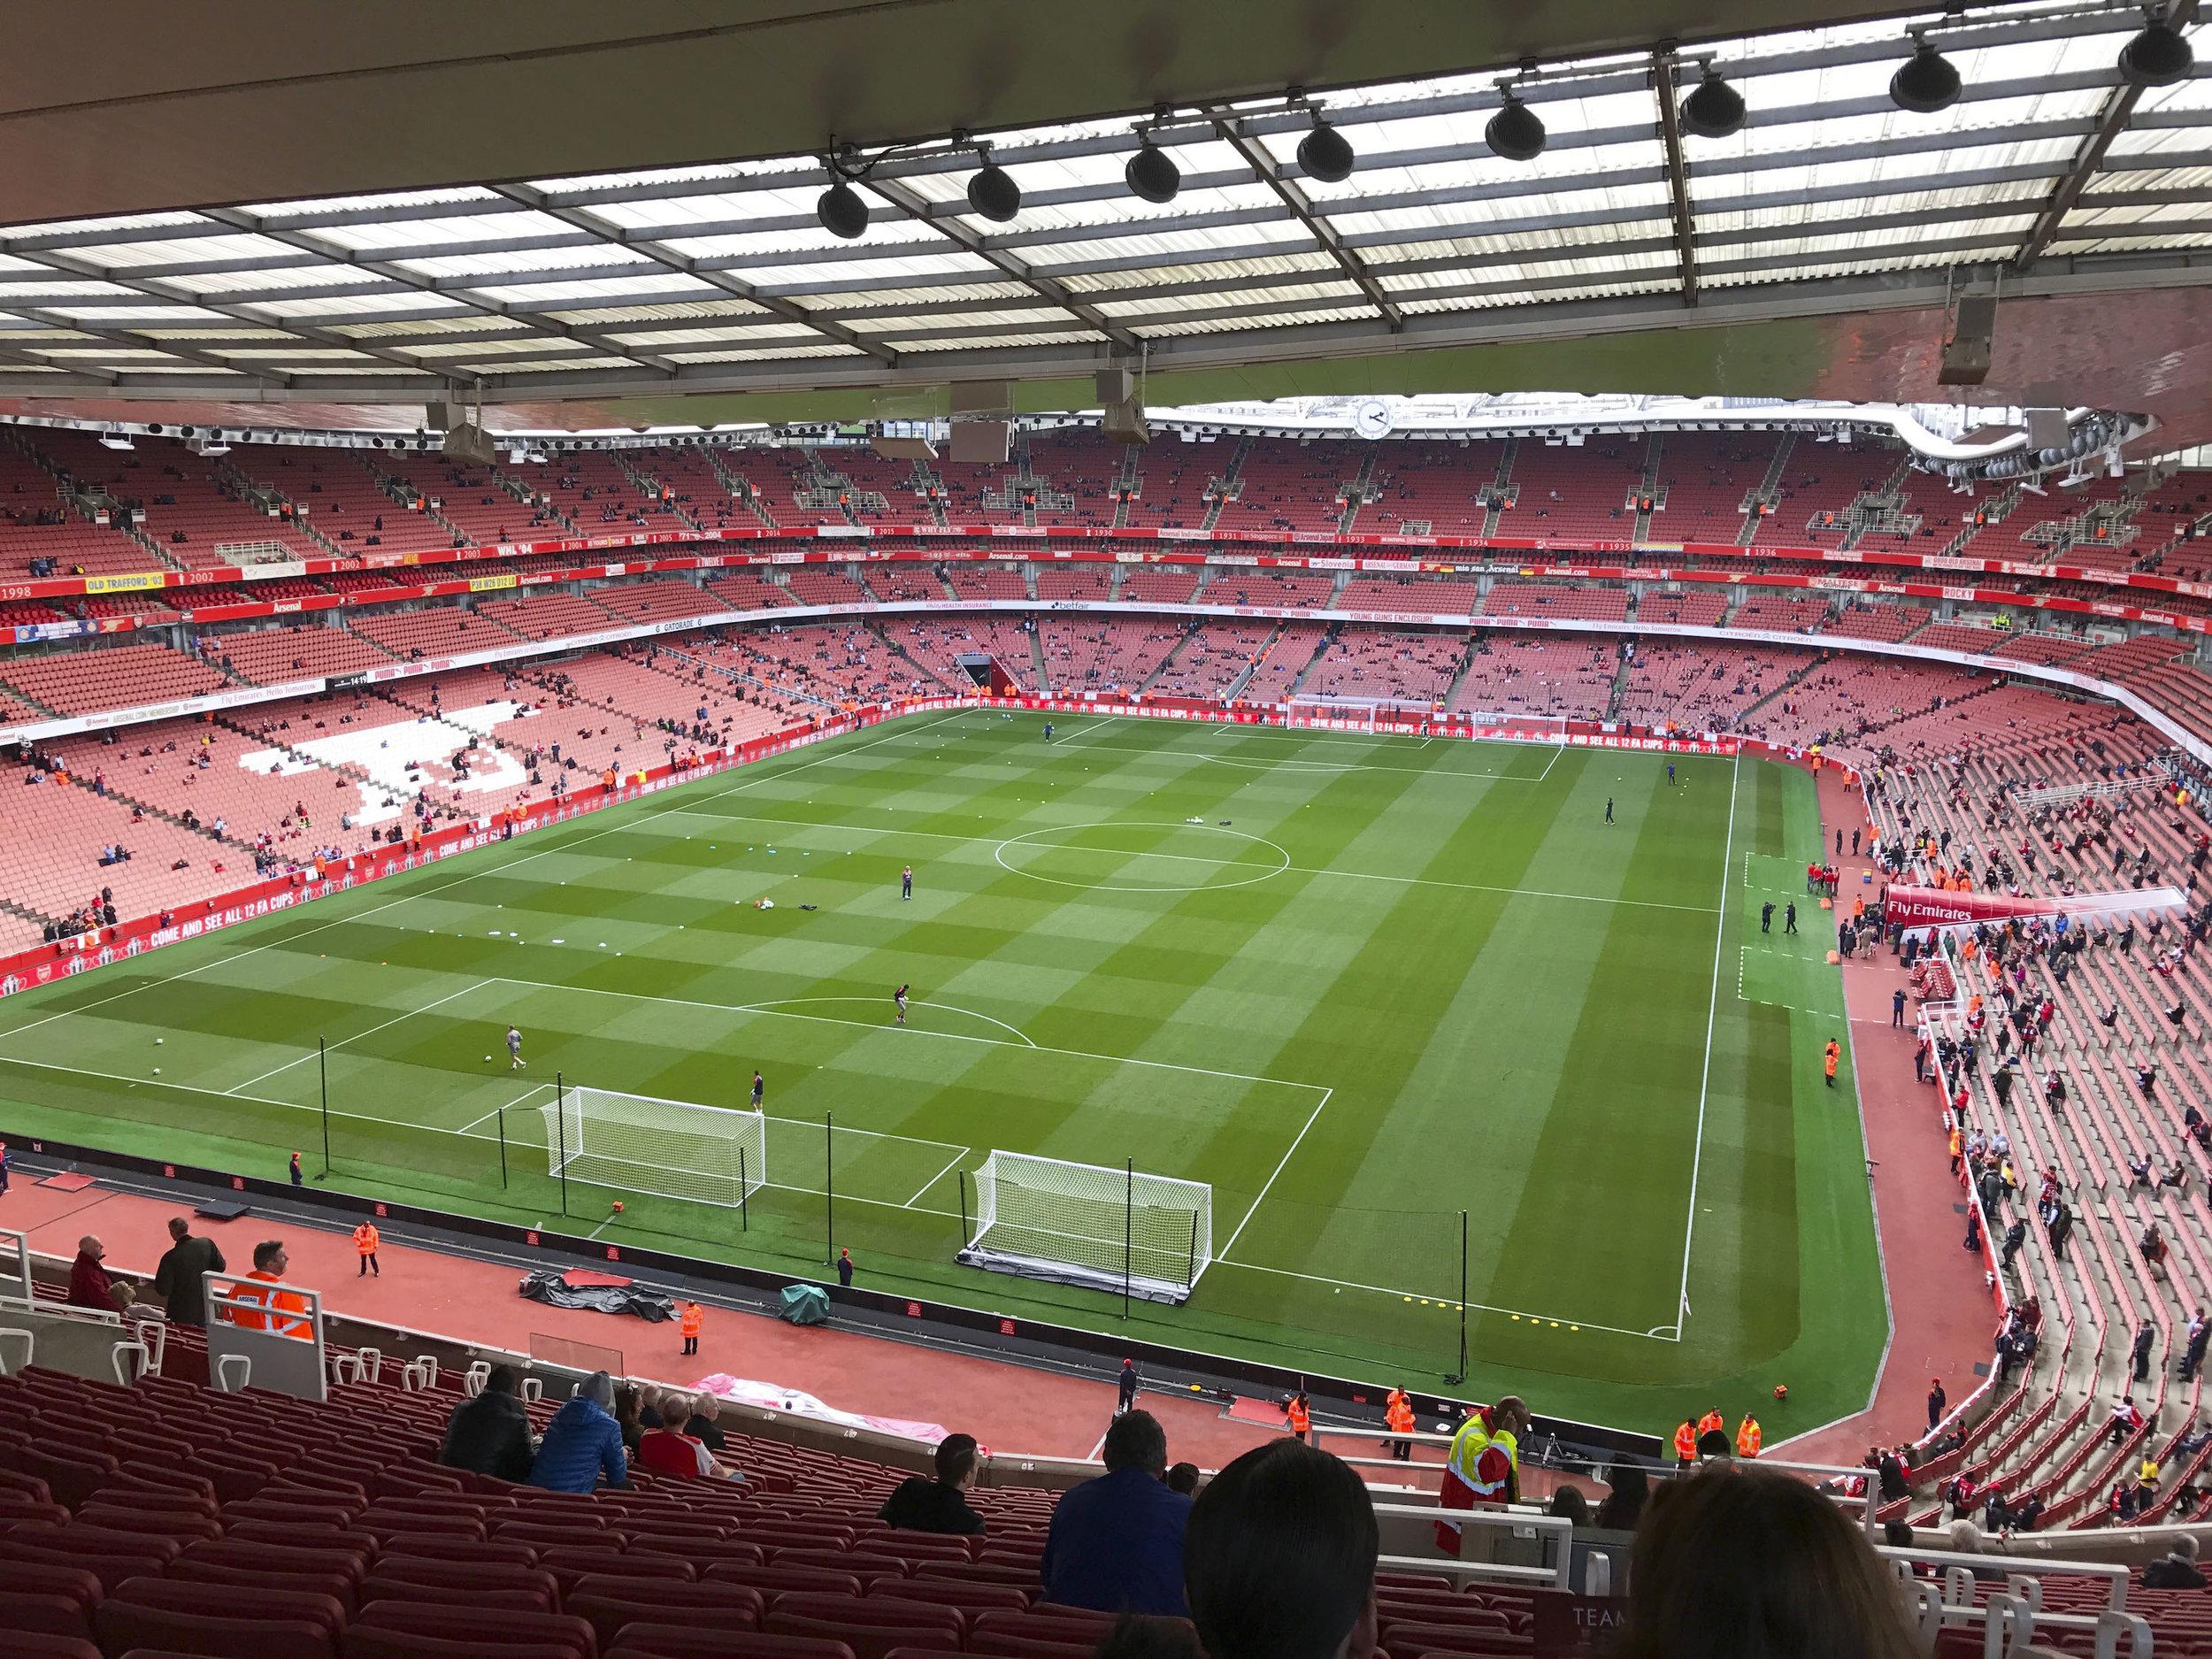 The pitch at Emirates Stadium | Arsenal Match | London Itinerary | BySarahRae.com